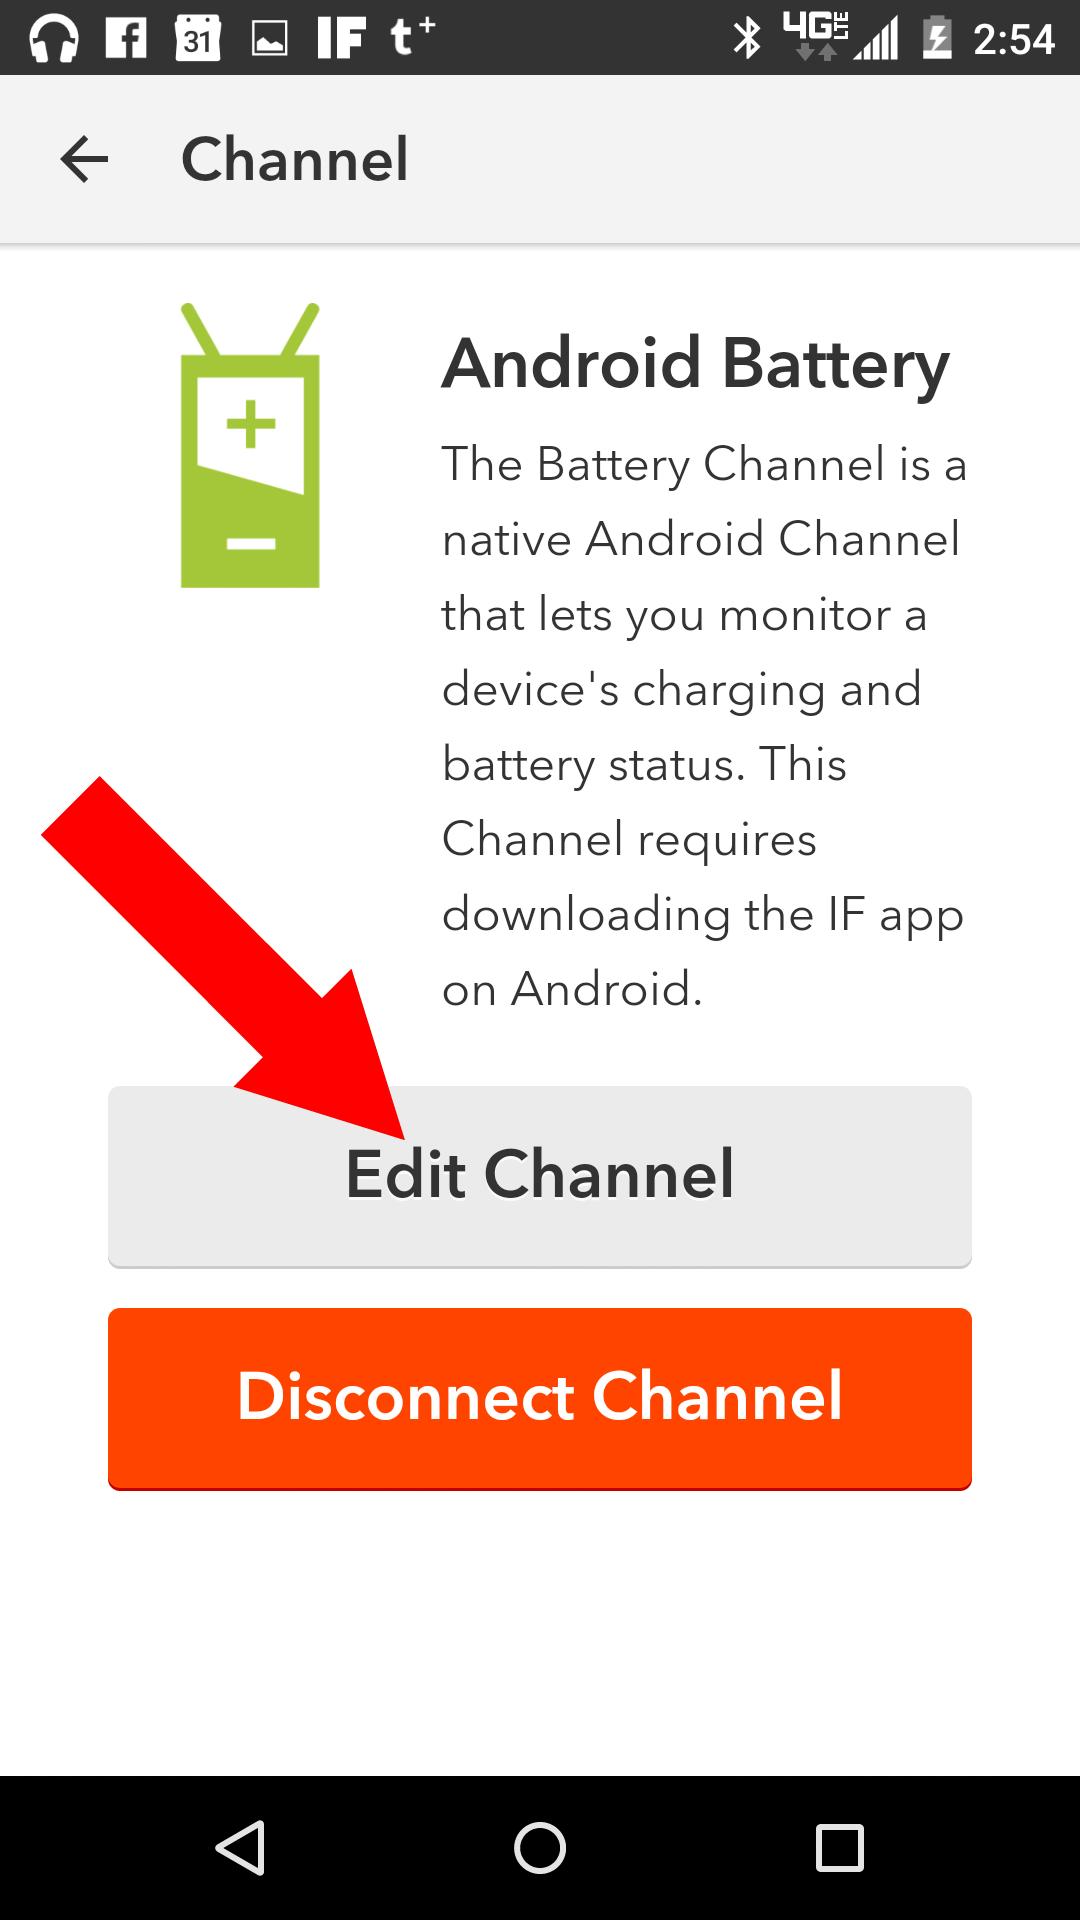 Edit Channel.